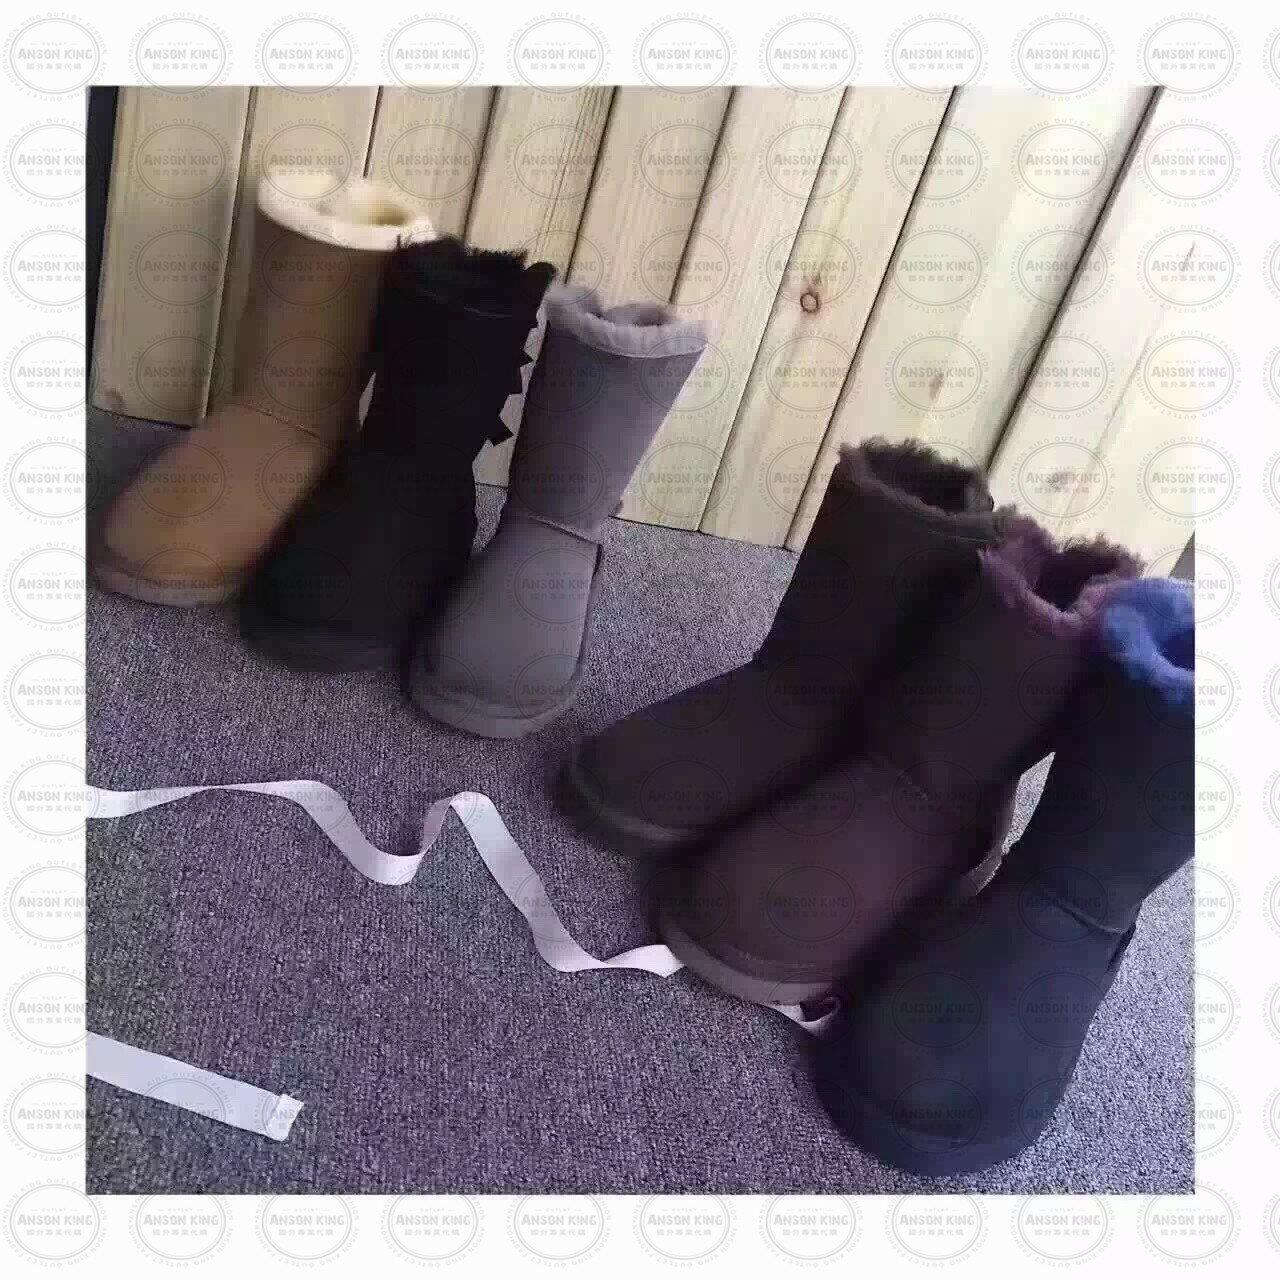 OUTLET正品代購 澳洲 UGG 蝴蝶結3280羊皮毛一體 中長靴 保暖 真皮羊皮毛 雪靴 短靴 藍色 1